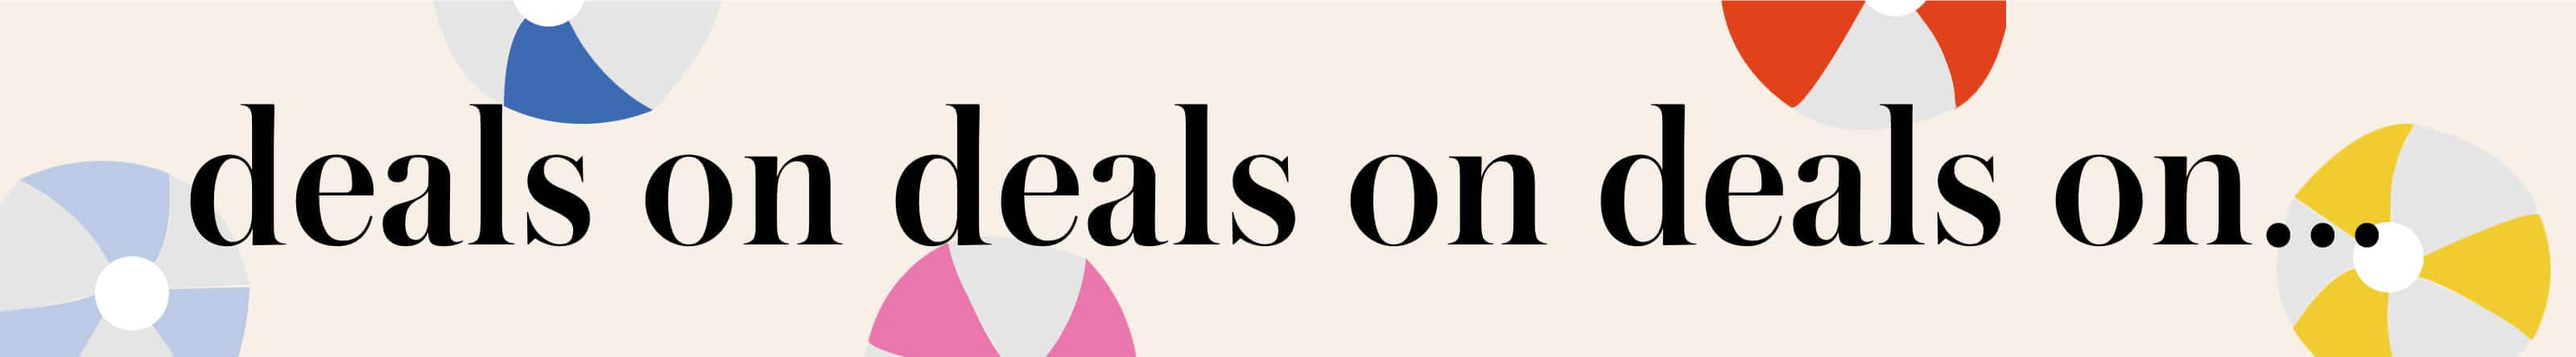 deals on deals on deals on...